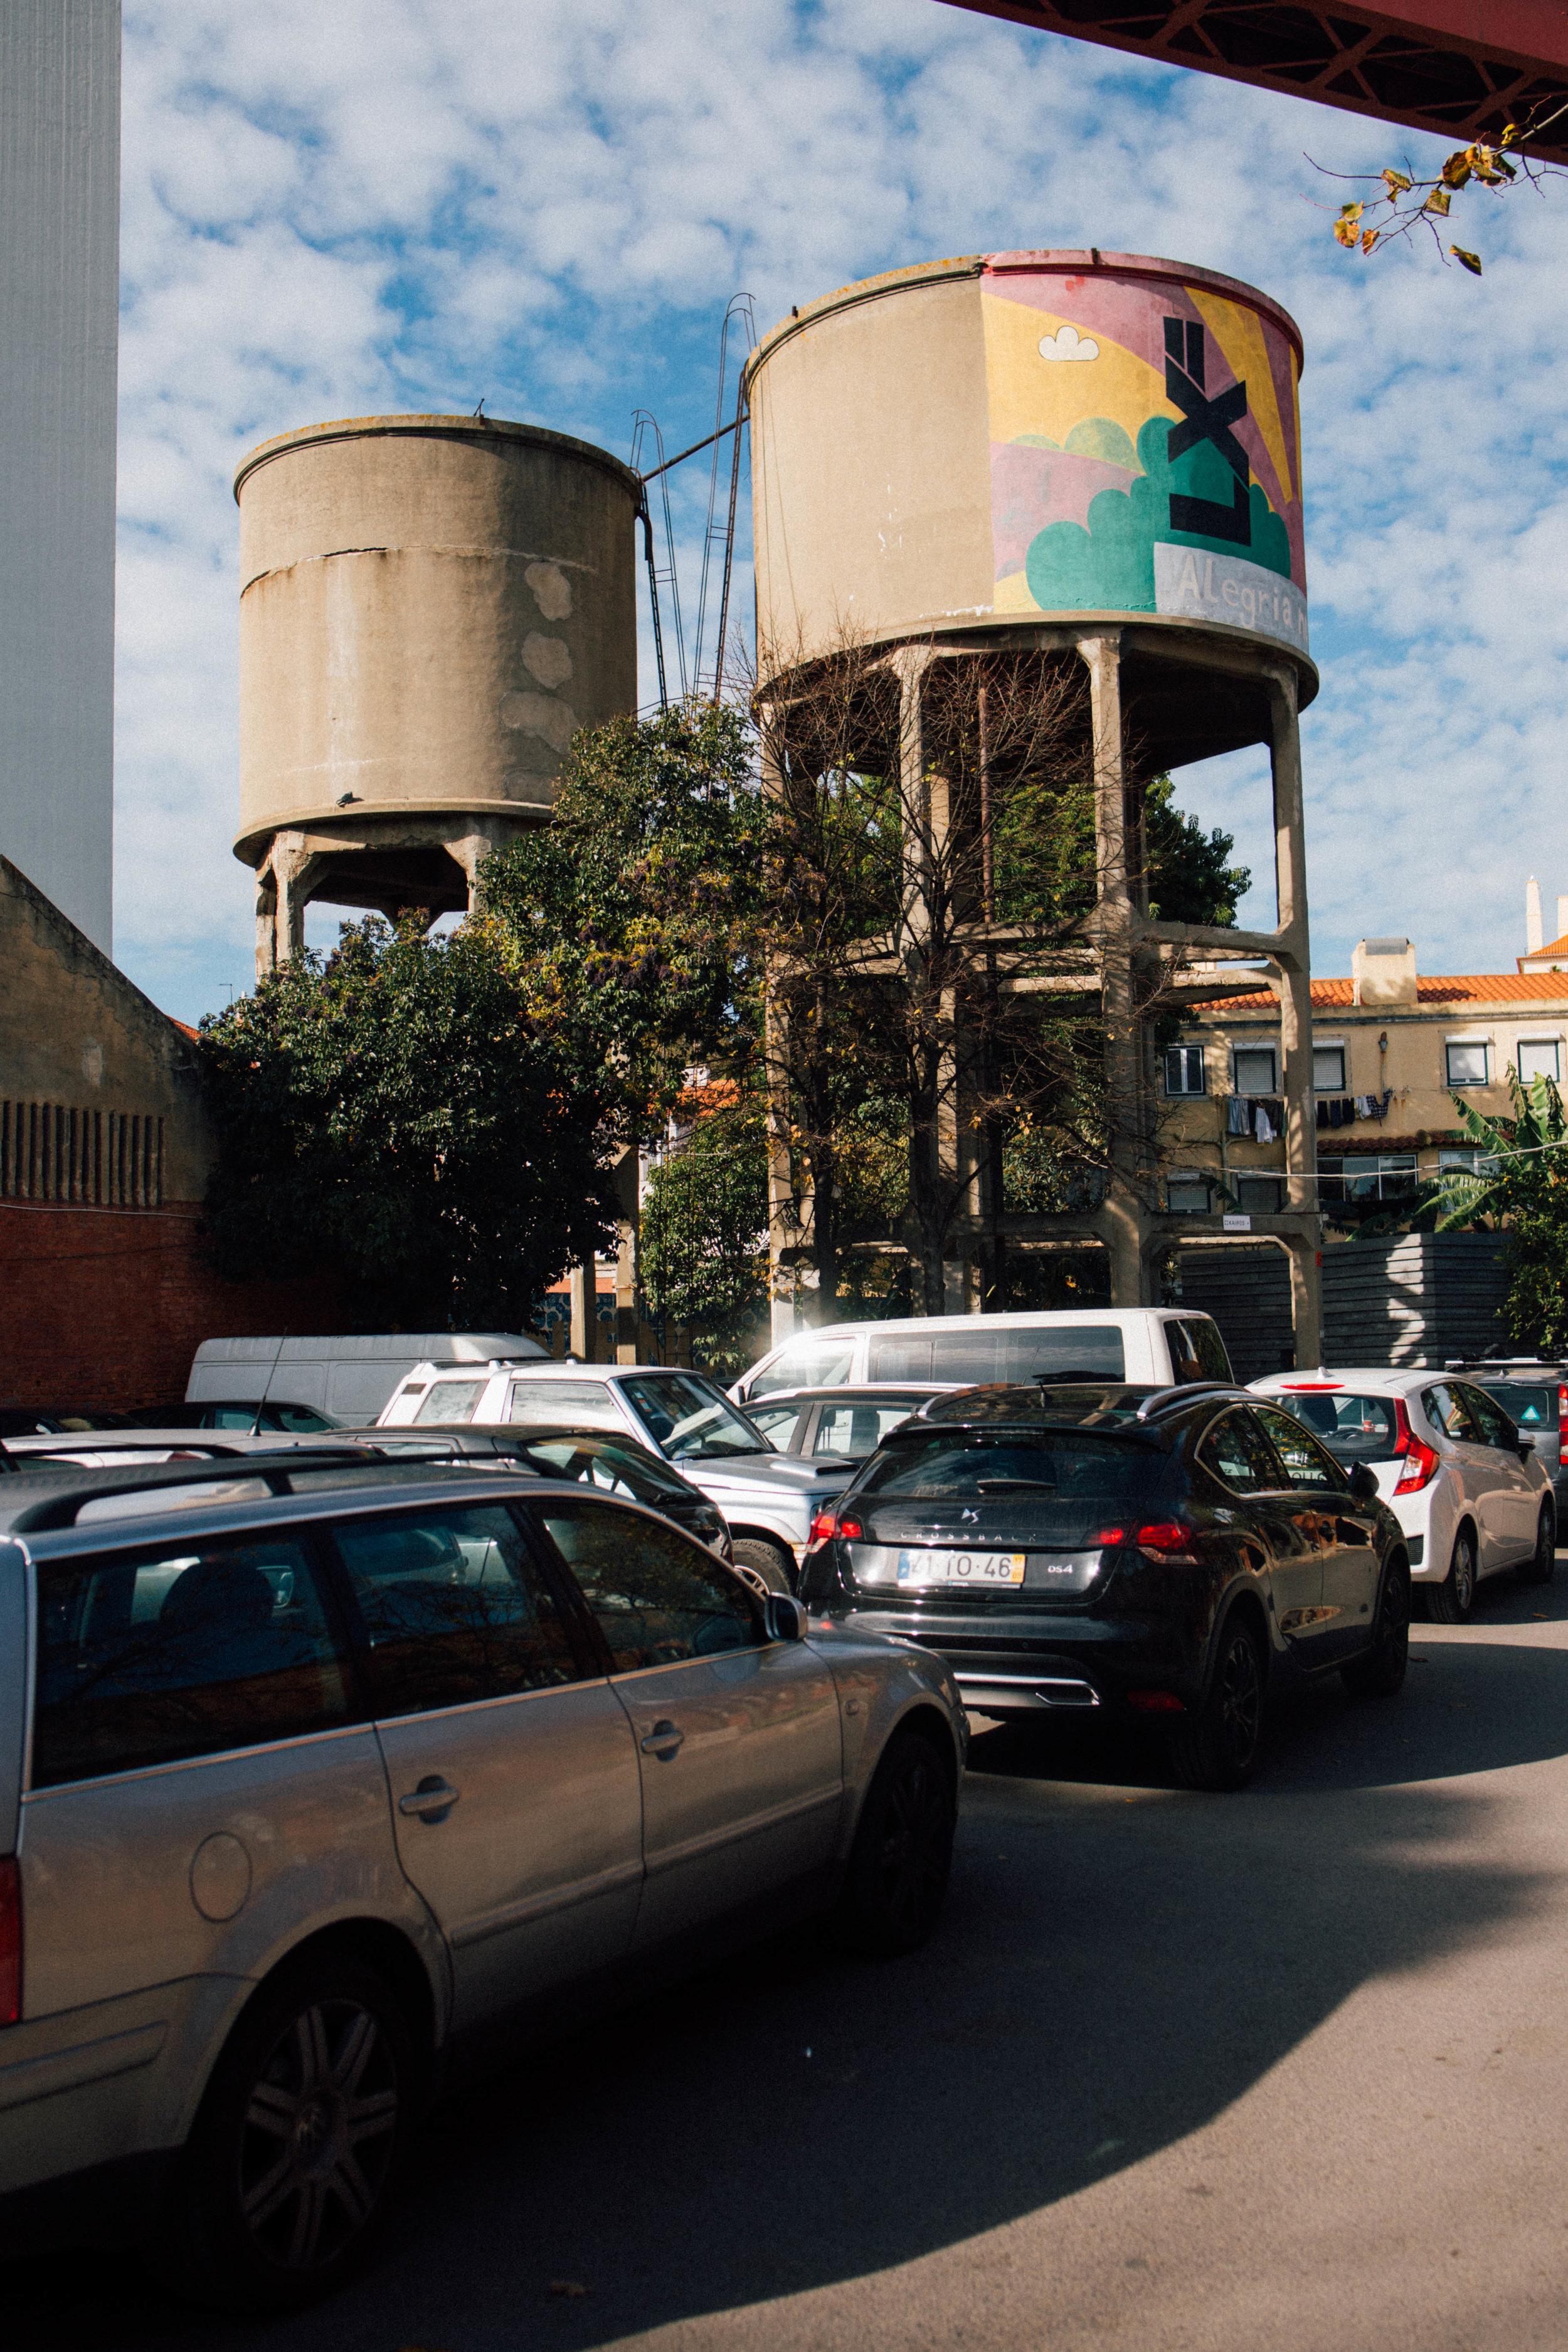 Lisboa By Jorge Güiro 59.jpg